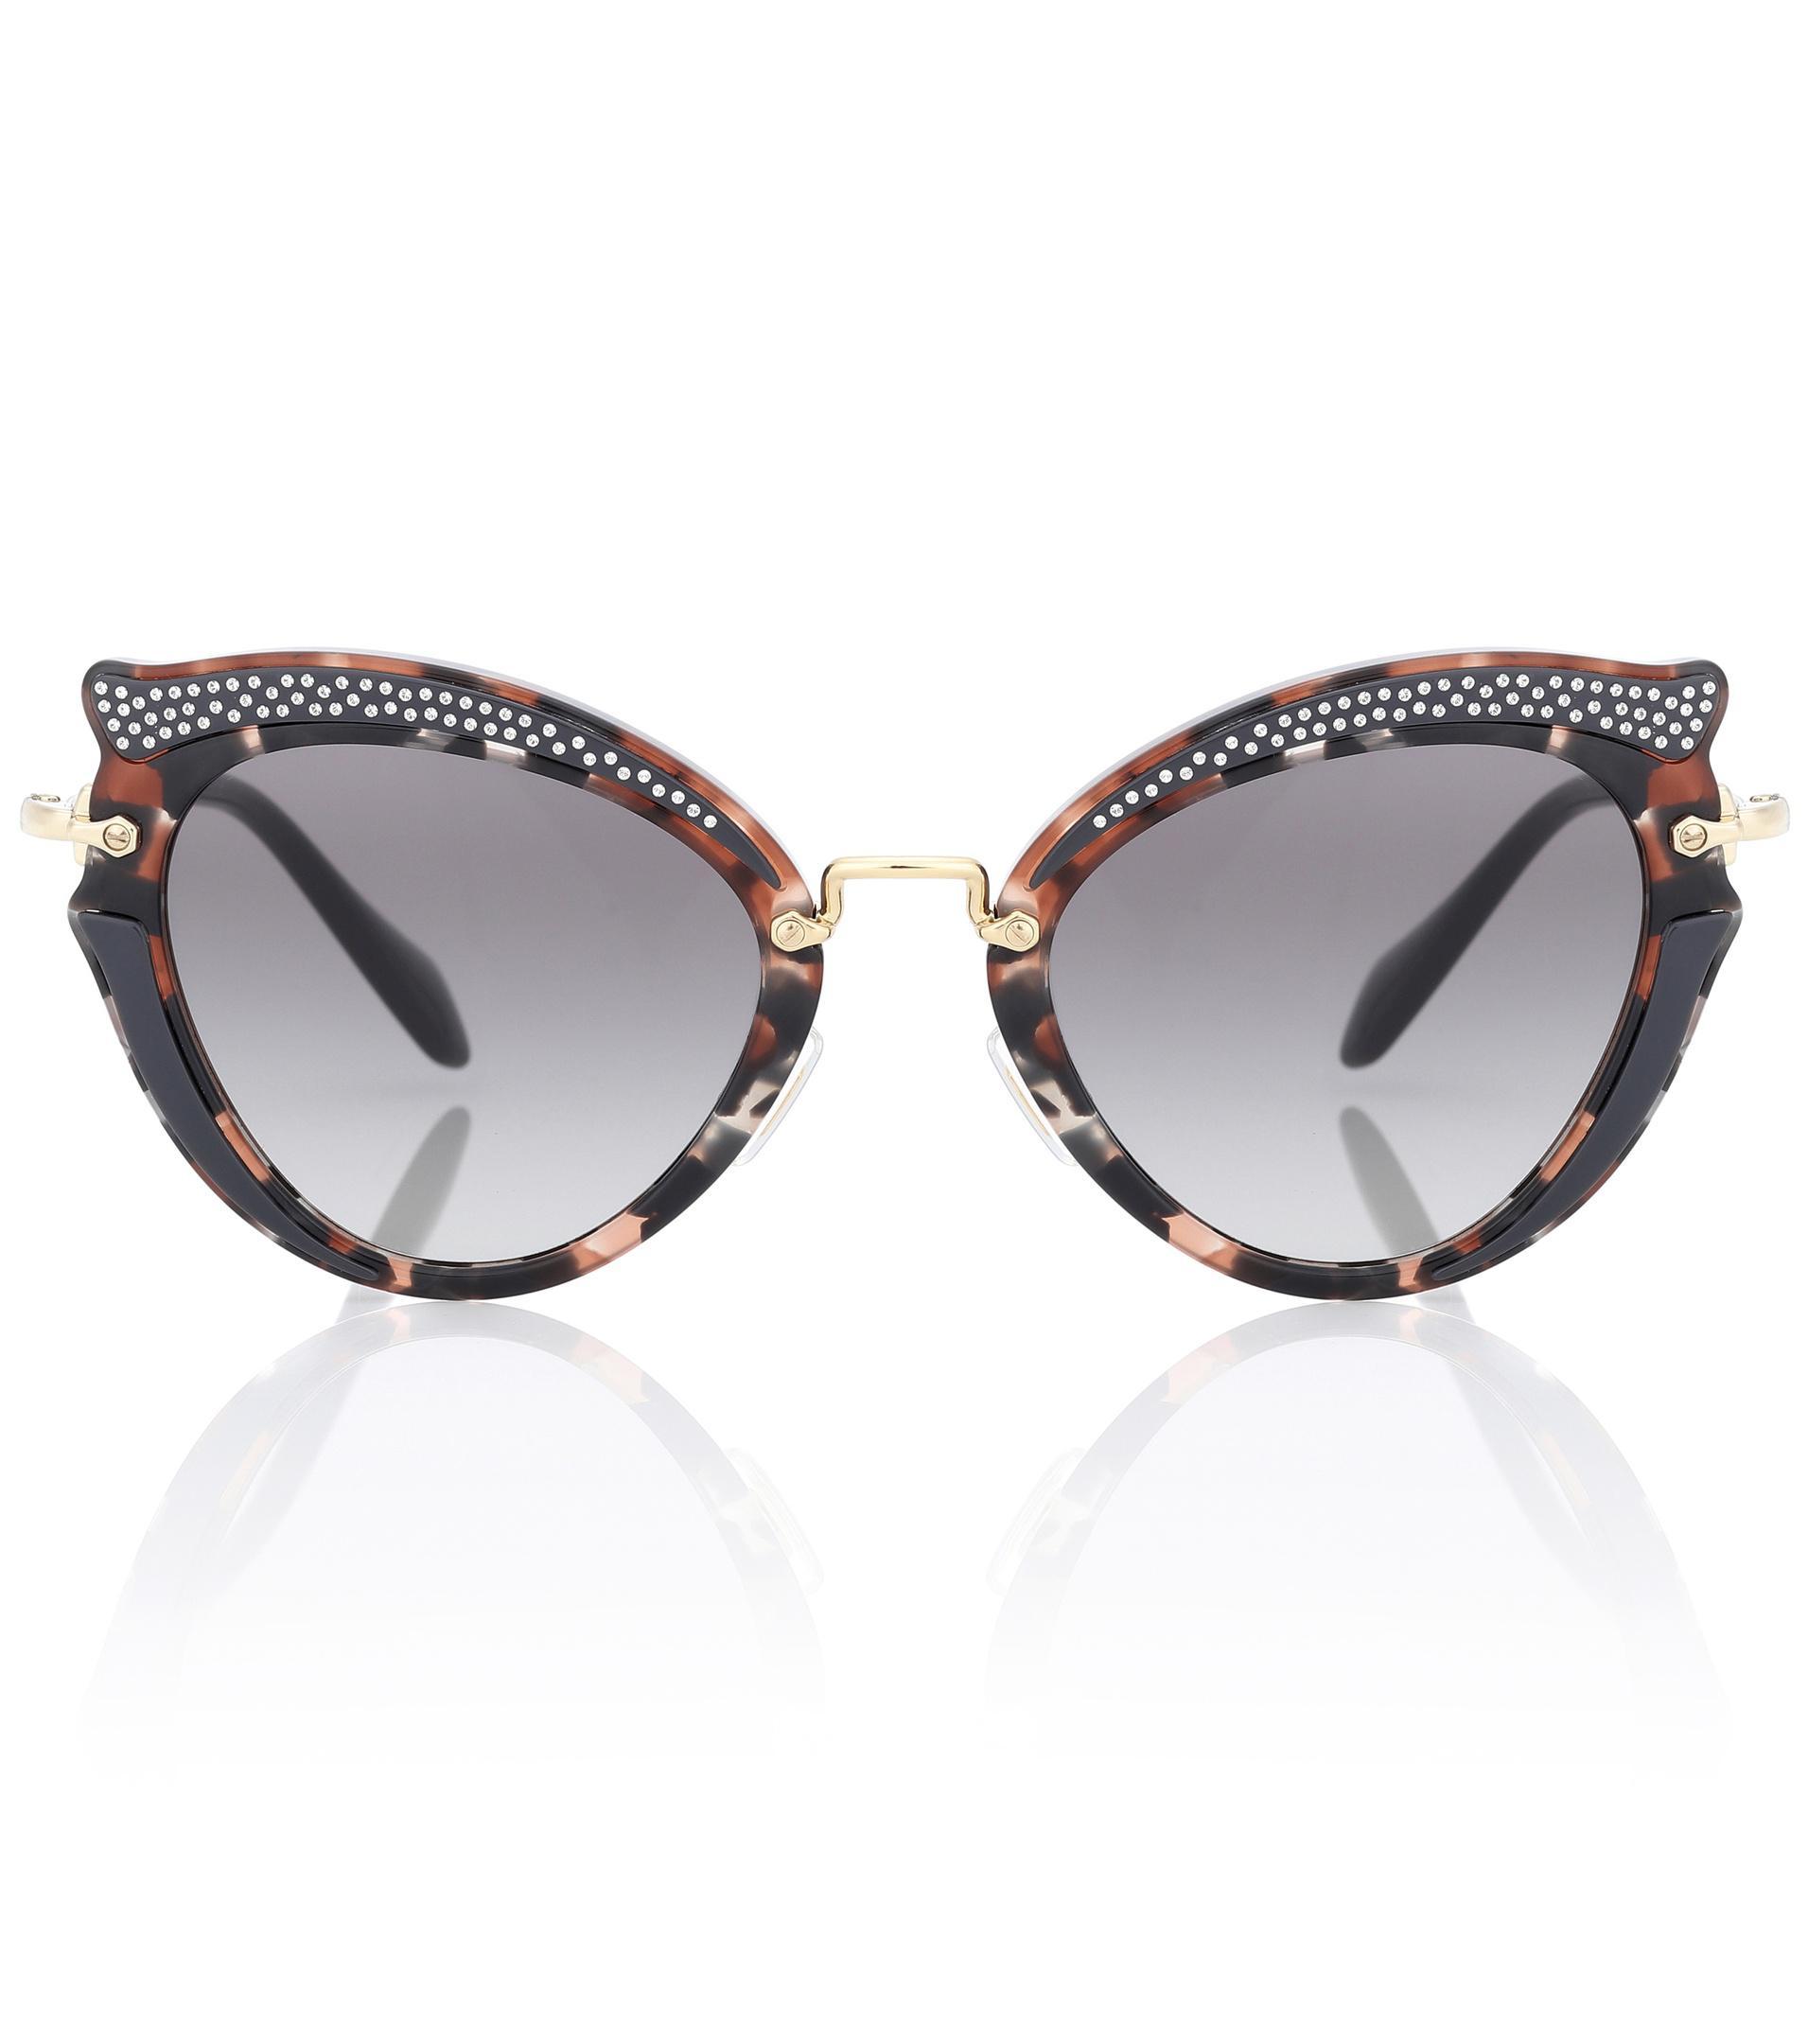 9f9ecb9453be Lyst - Miu Miu Noir Embellished Cat-eye Sunglasses in Brown